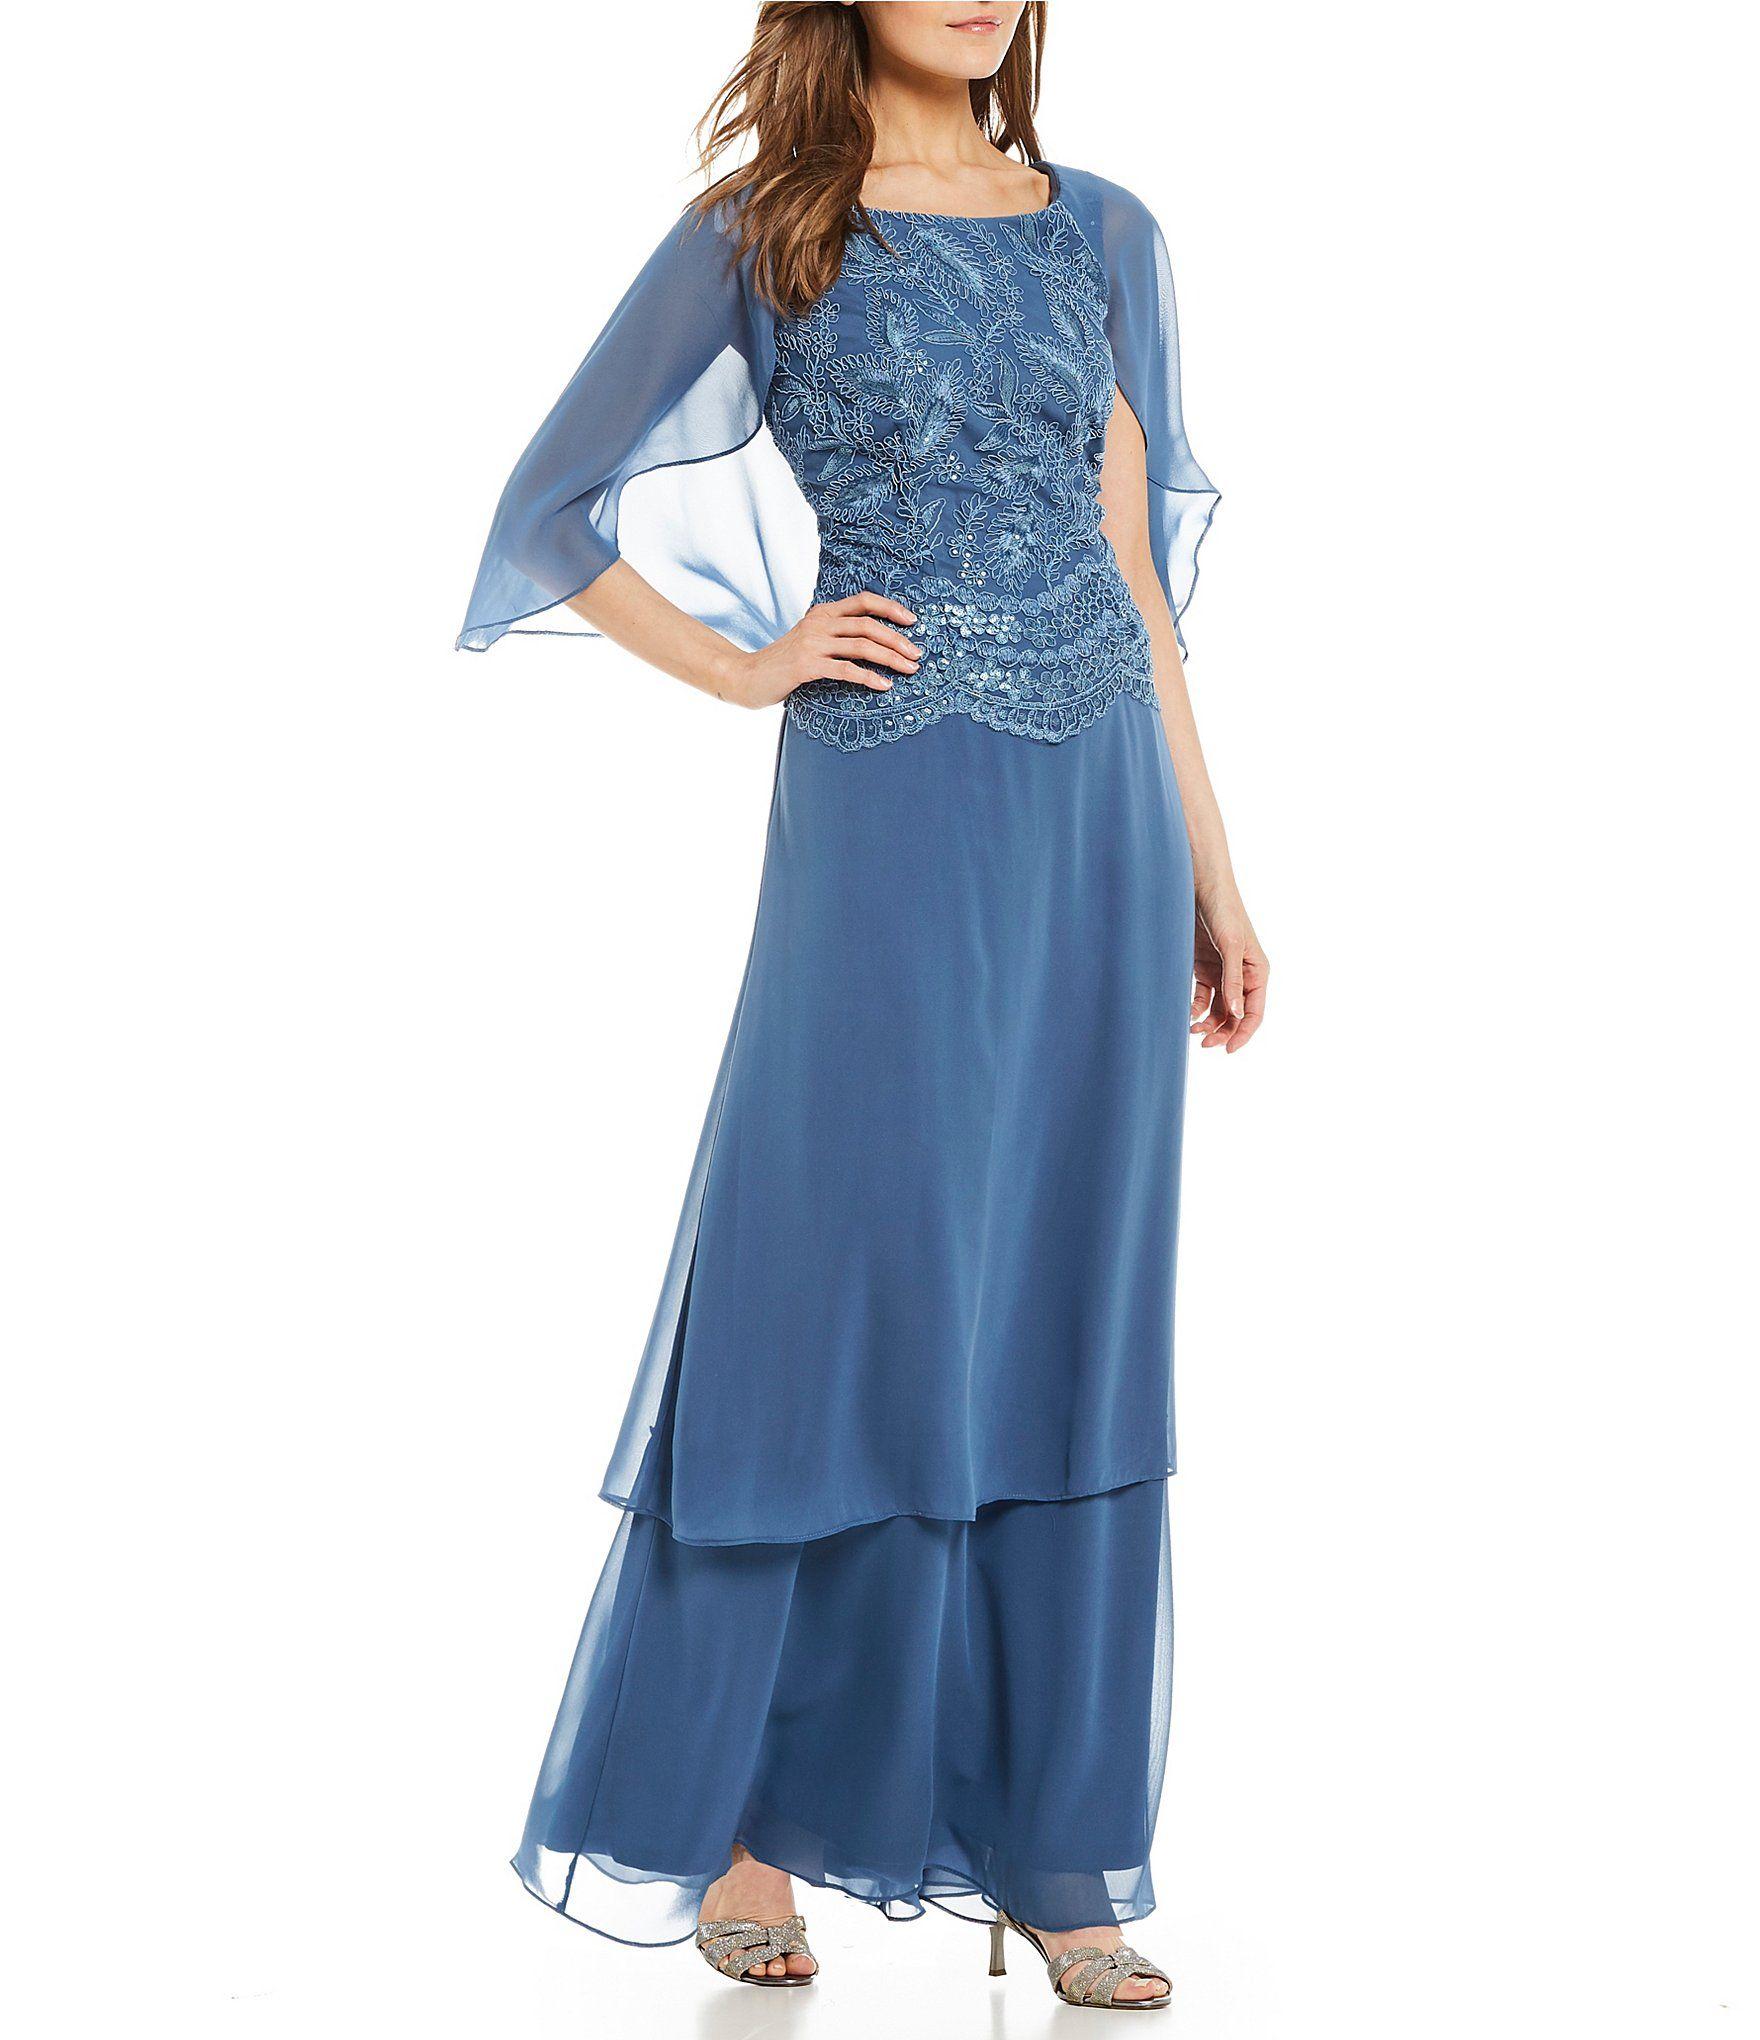 5acf37875c Shop for Le Bos Sequin Embroidered Capelet Long Dress at Dillards.com. Visit  Dillards